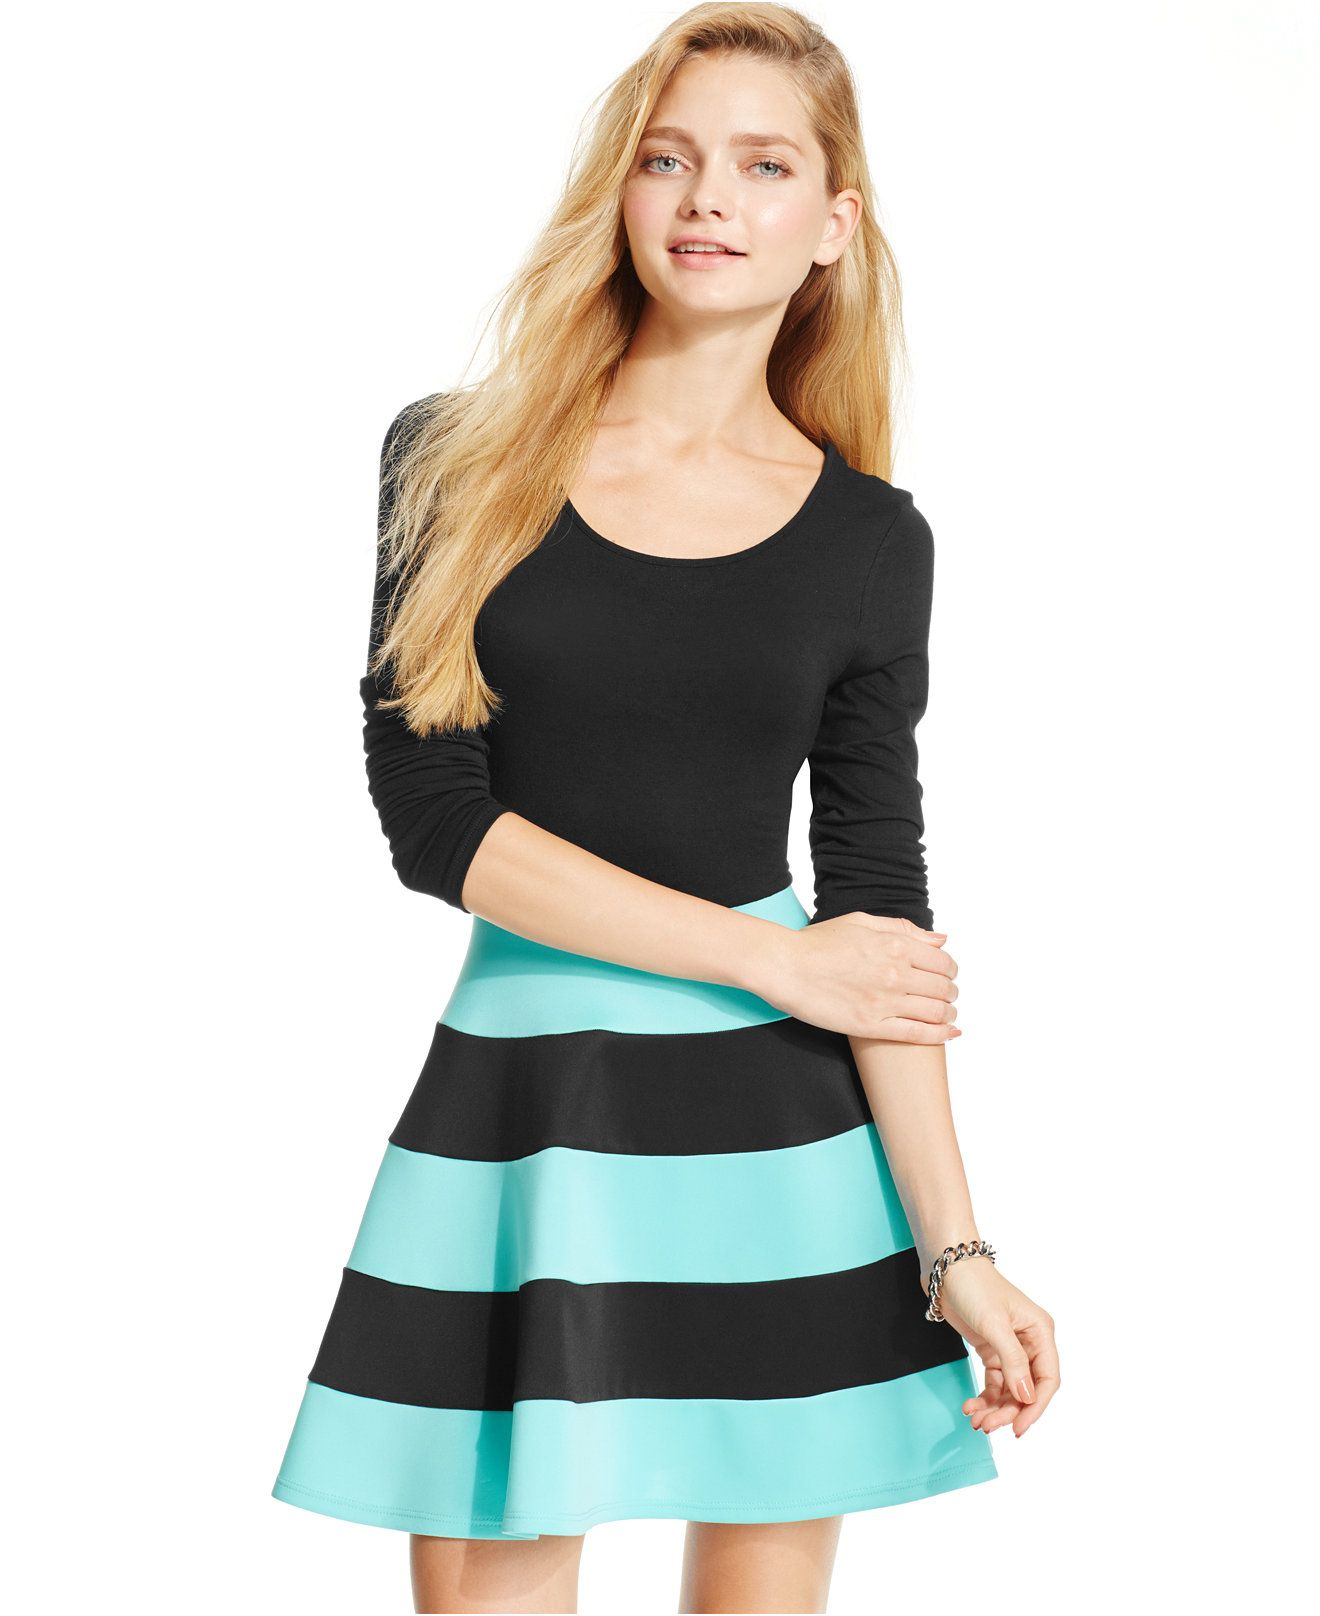 a12b1cd3d Trixxi Juniors' Long-Sleeve Colorblock Skater Dress - Teenage Dresses -  Browse - Macy's